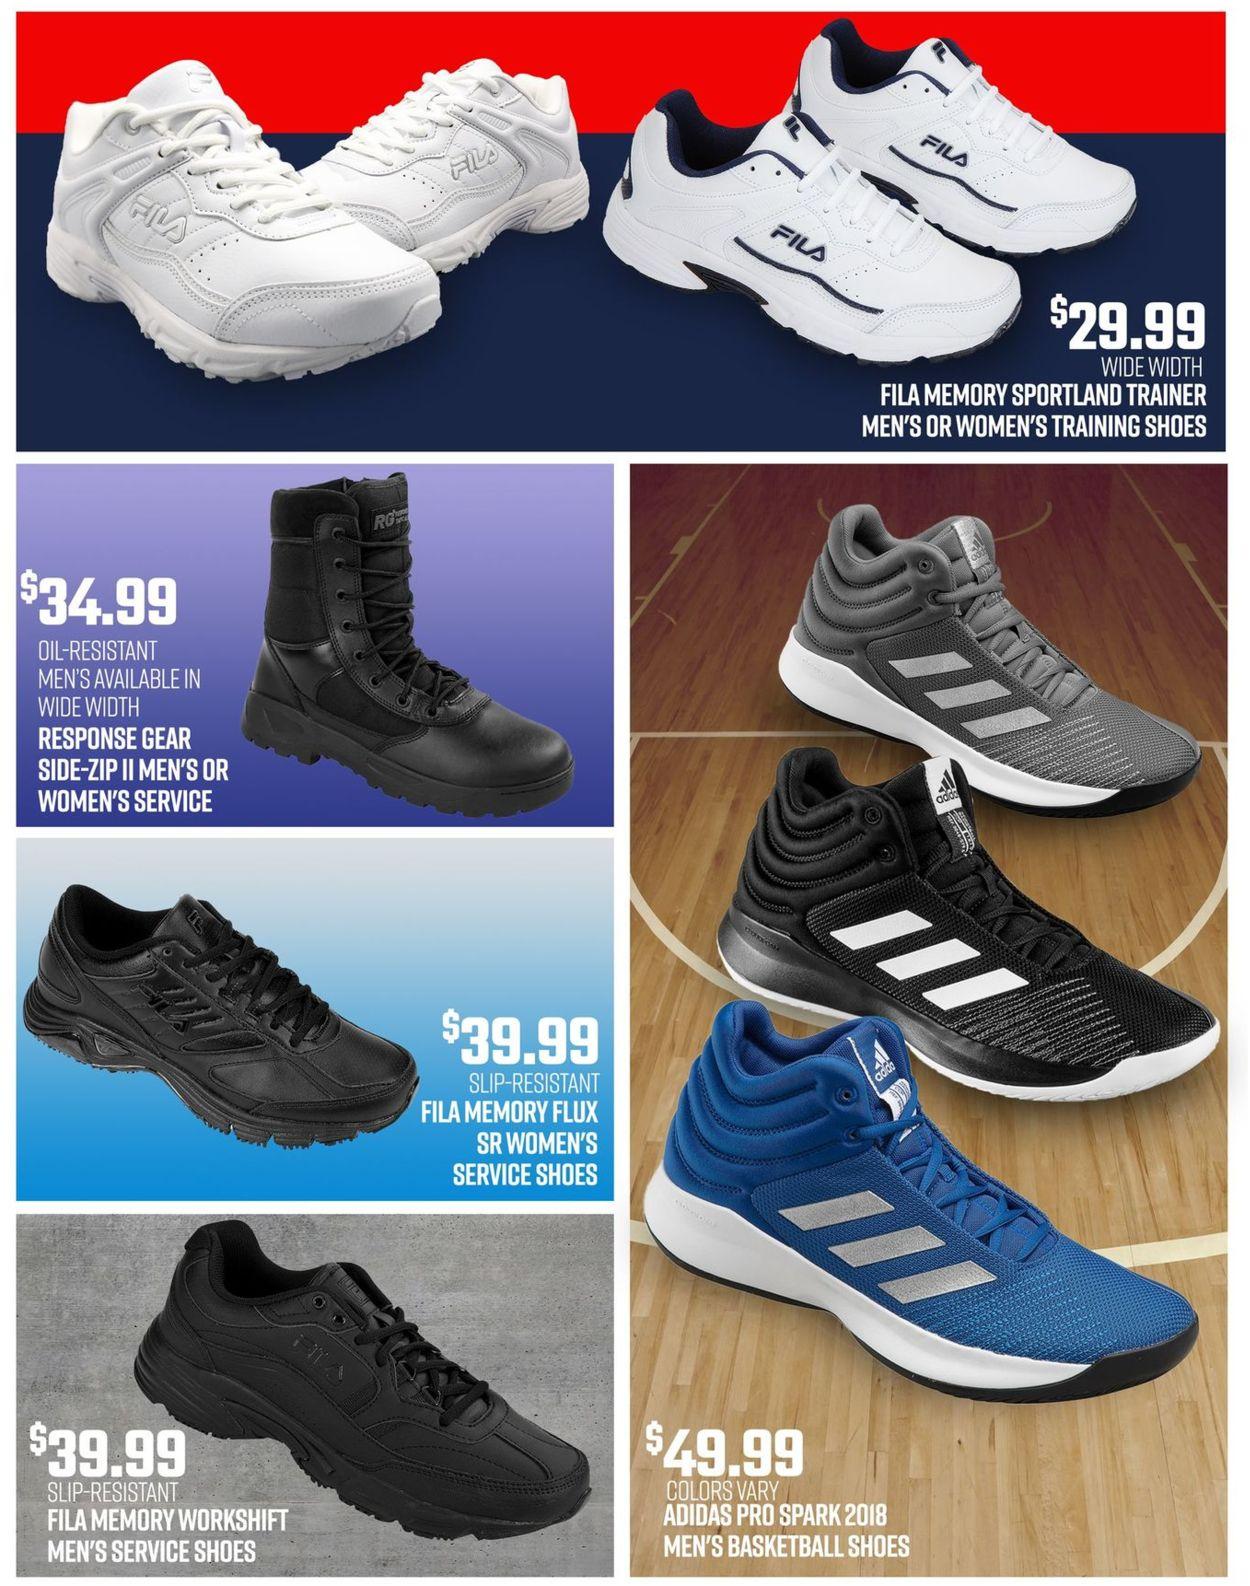 ny design Lagra kupongkoder Big 5 Current weekly ad 01/09 - 02/08/2020 [3] - frequent-ads.com